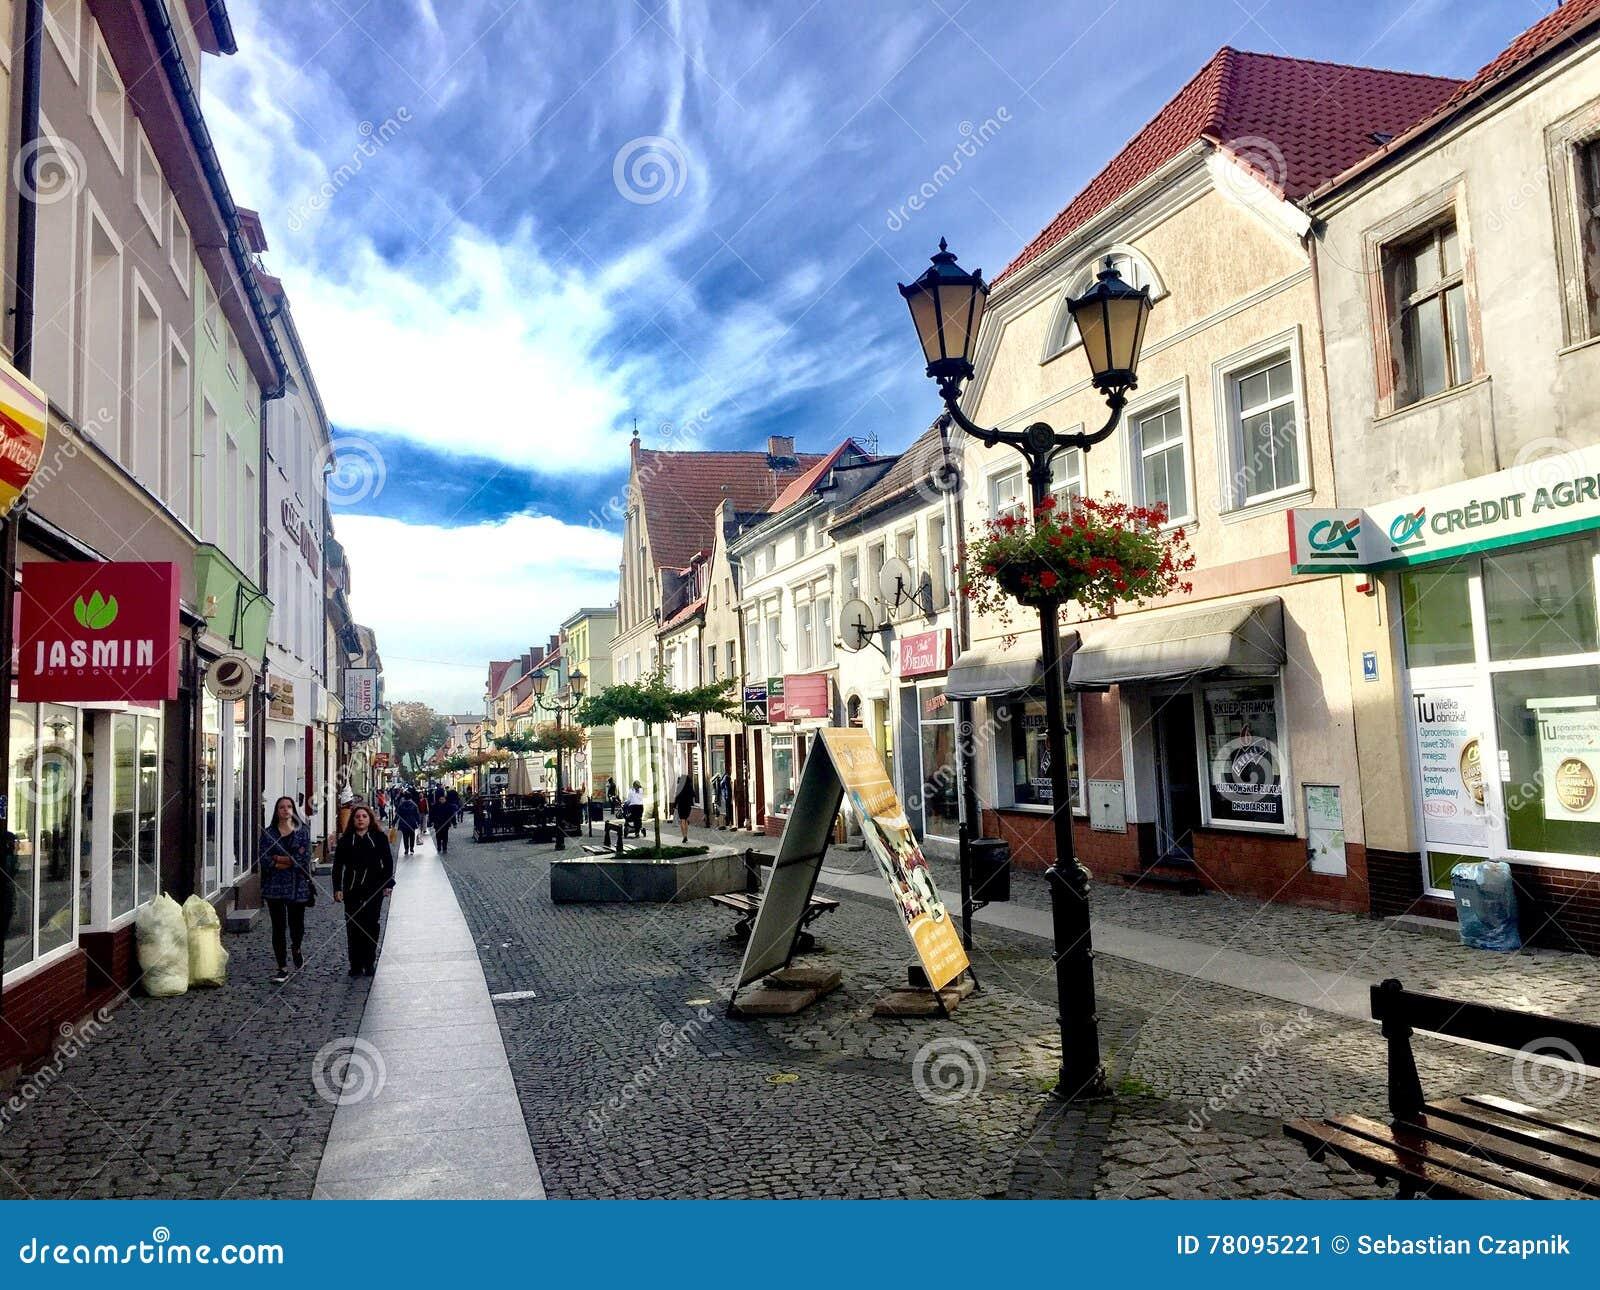 Darlowo main old town street